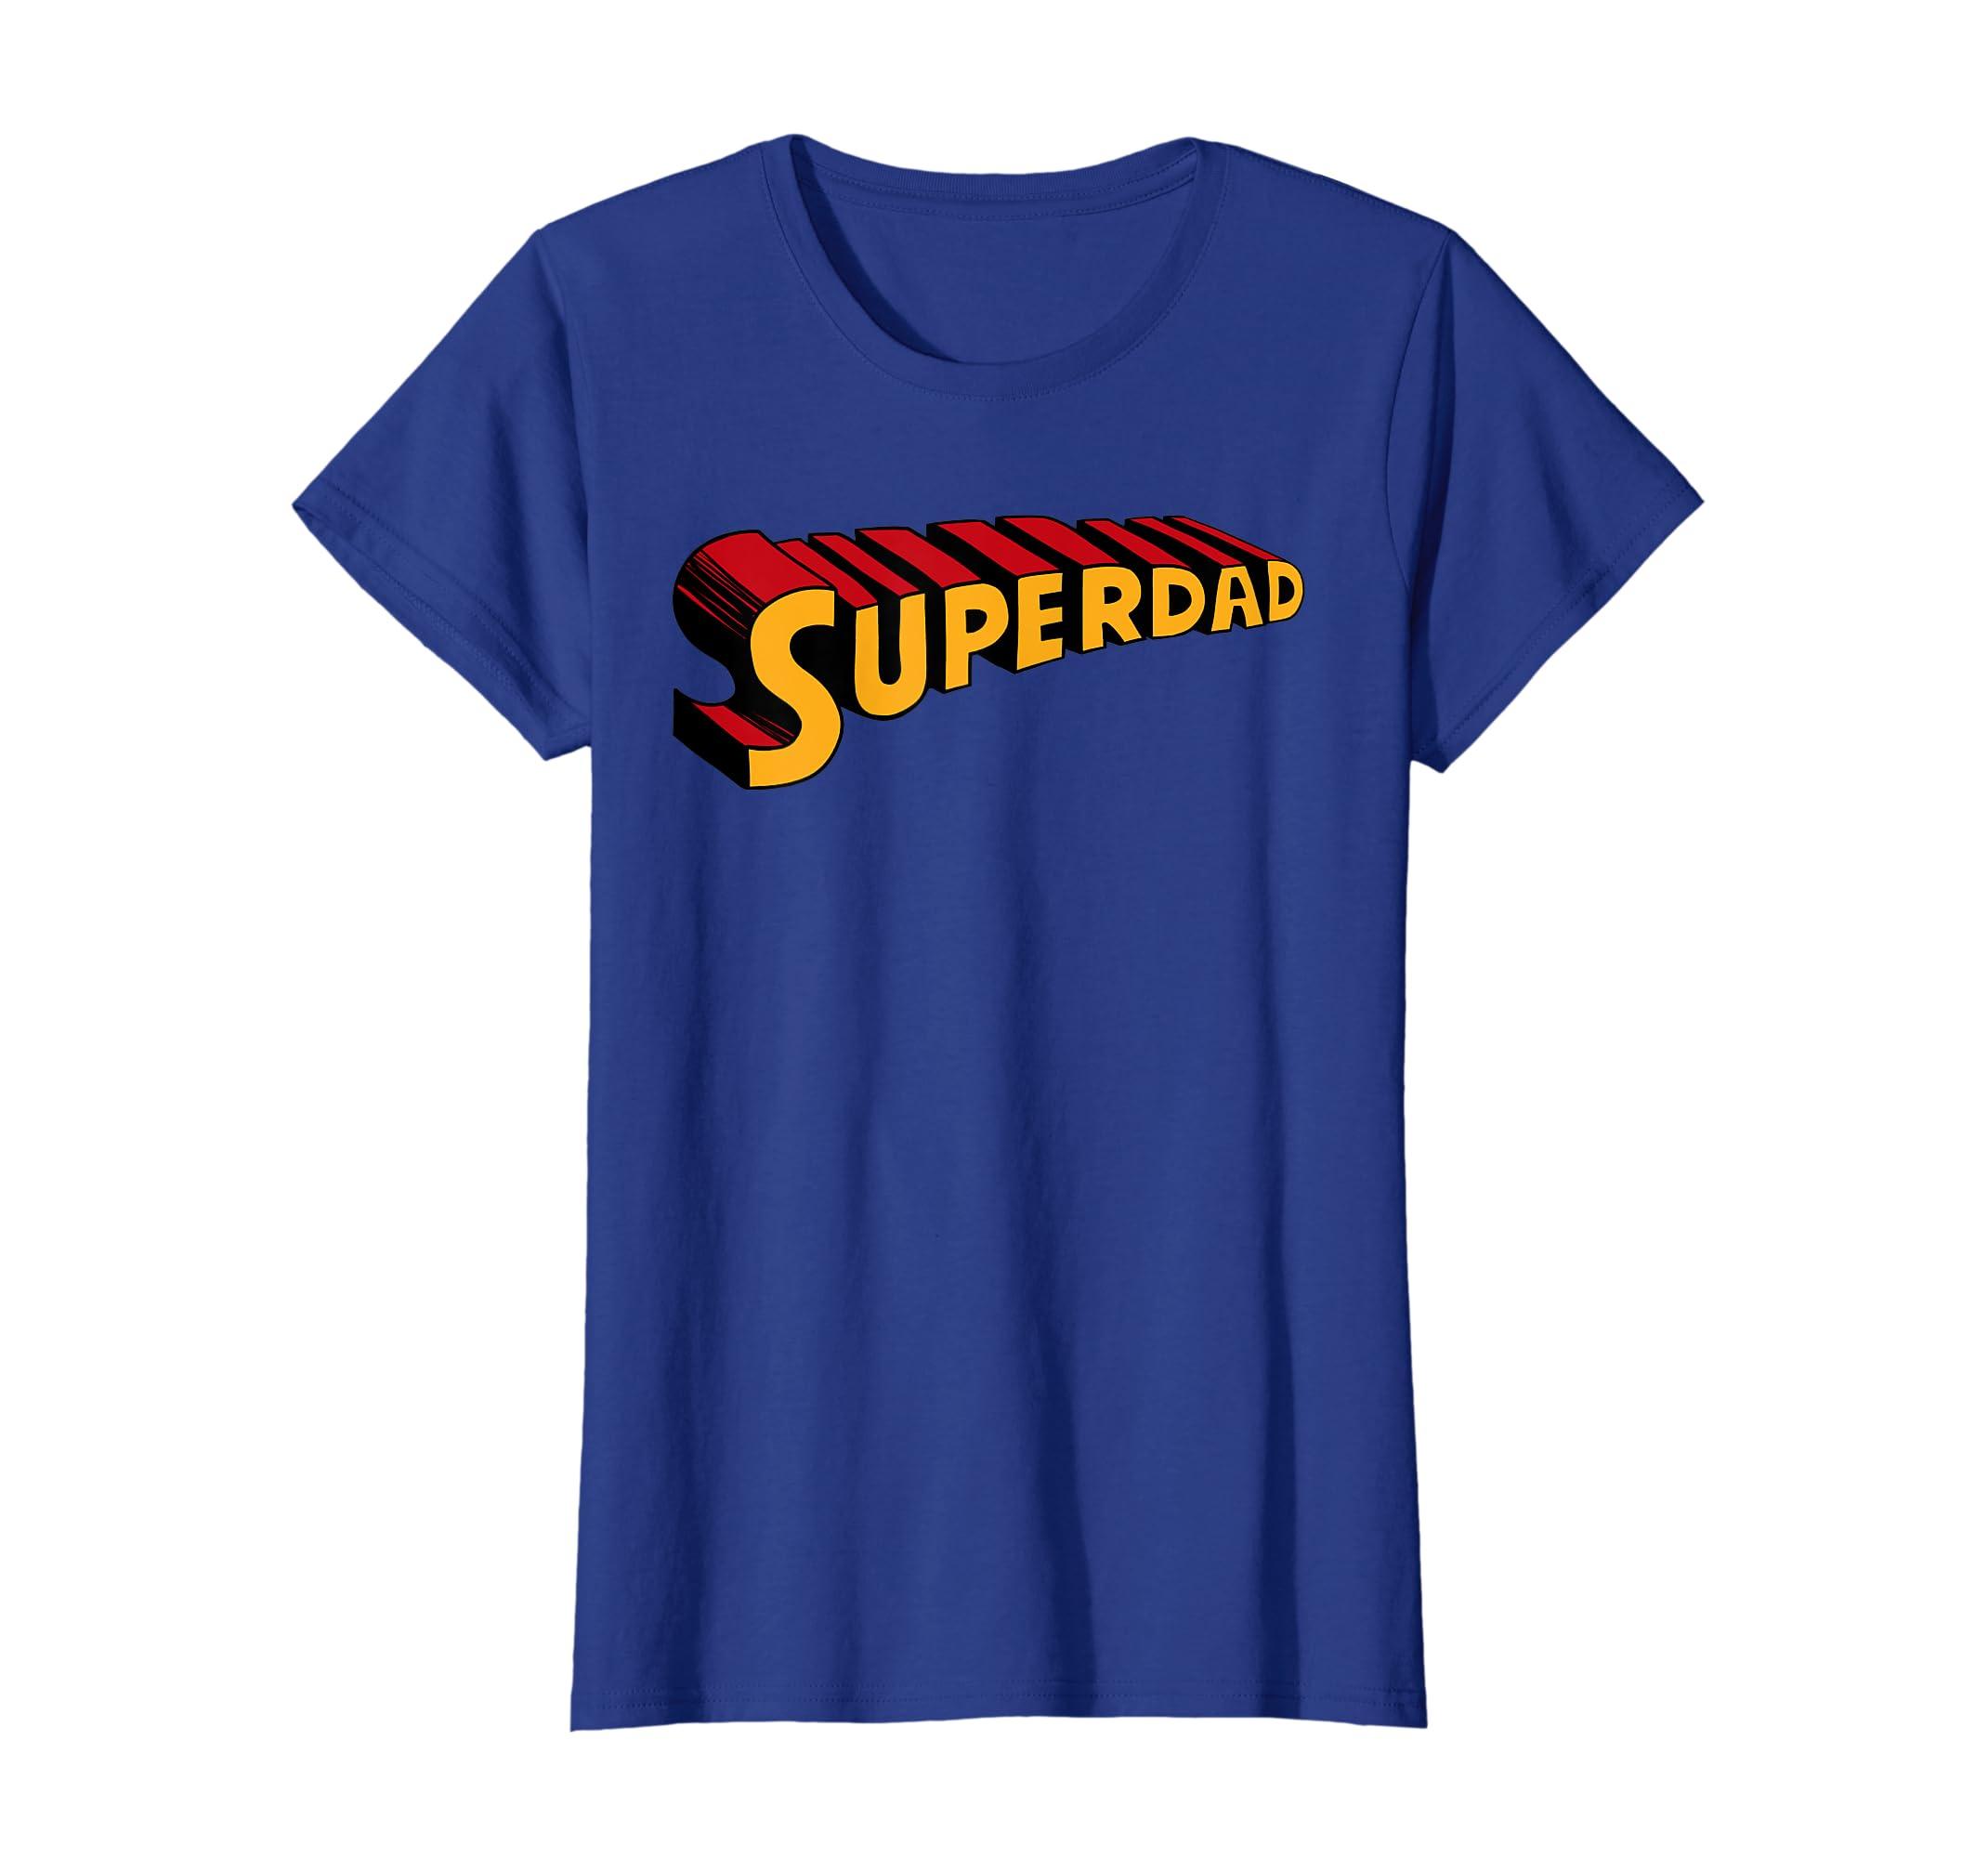 26b41b1f Amazon.com: Super dad Superdad shirt Funny Superhero Dad T-shirt: Clothing